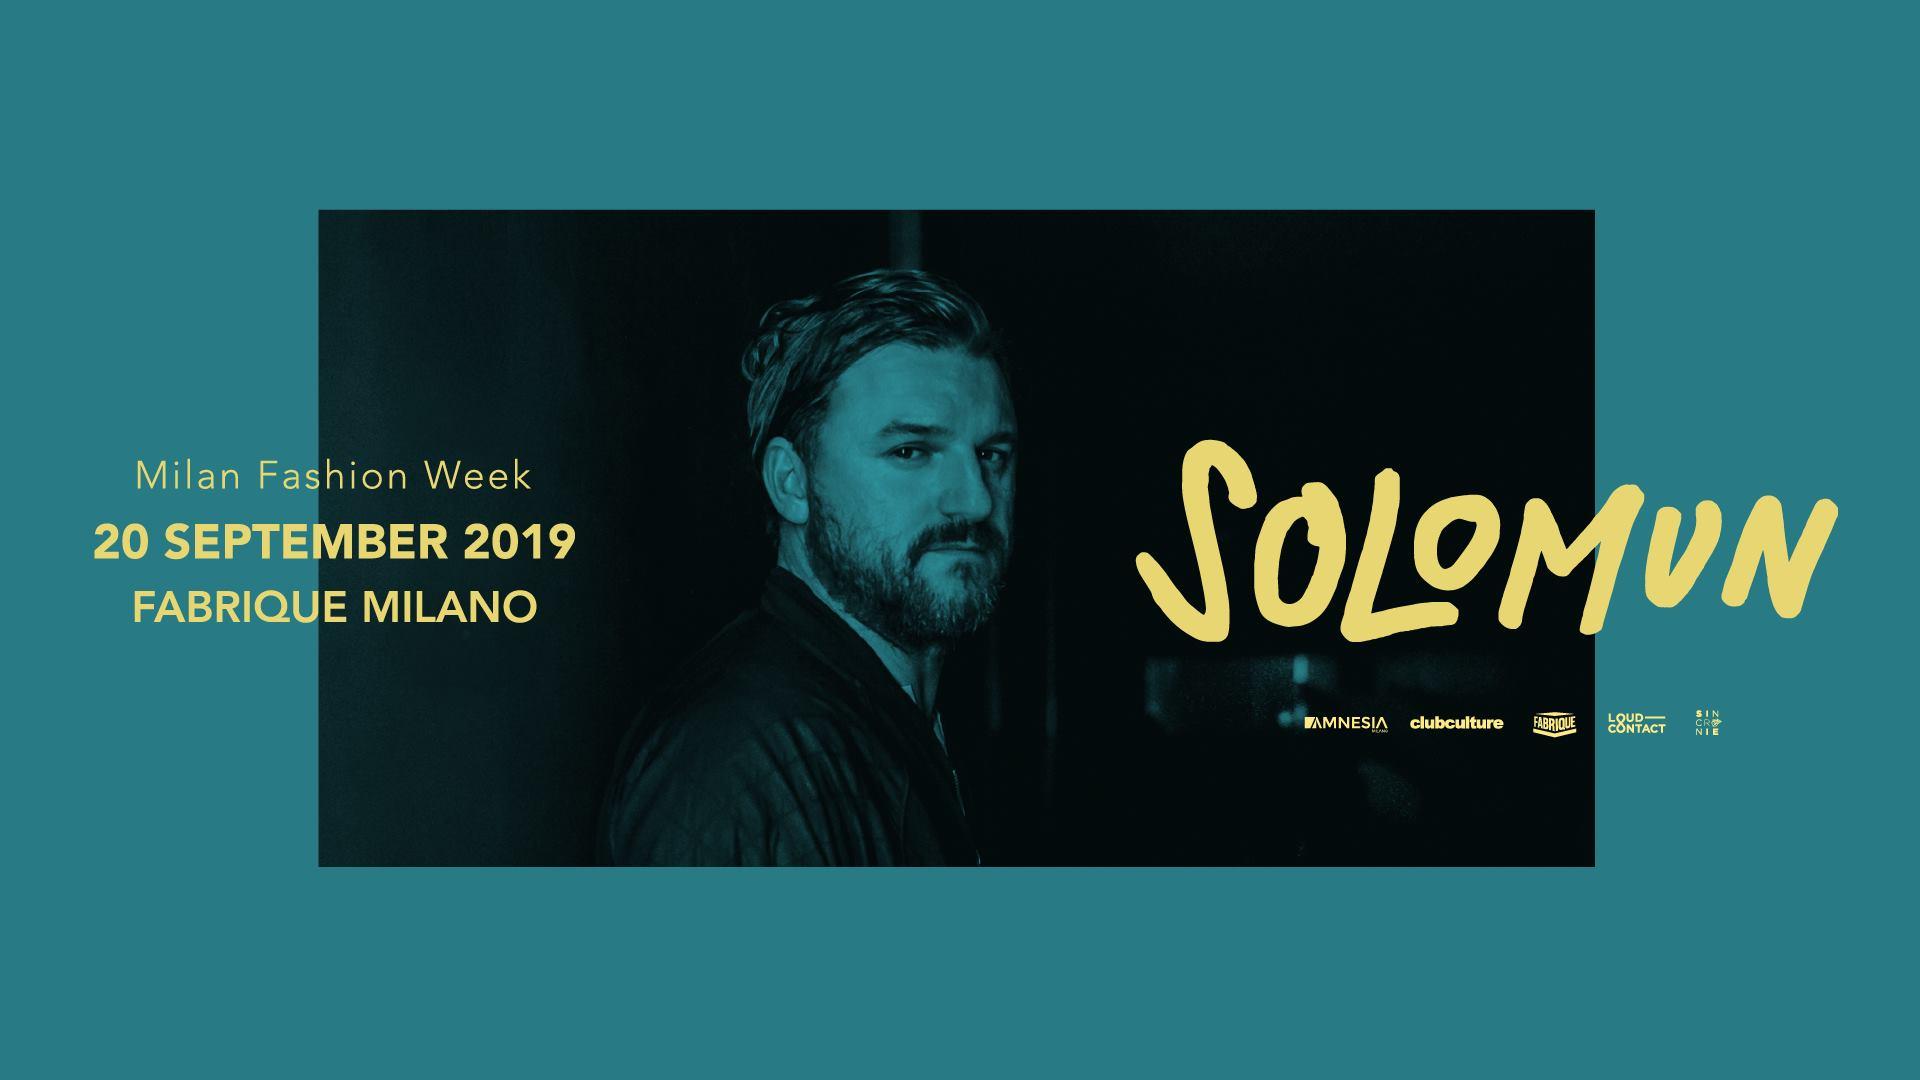 Fabrique  Milano – Solomun – Venerdì 20 settembre 2019